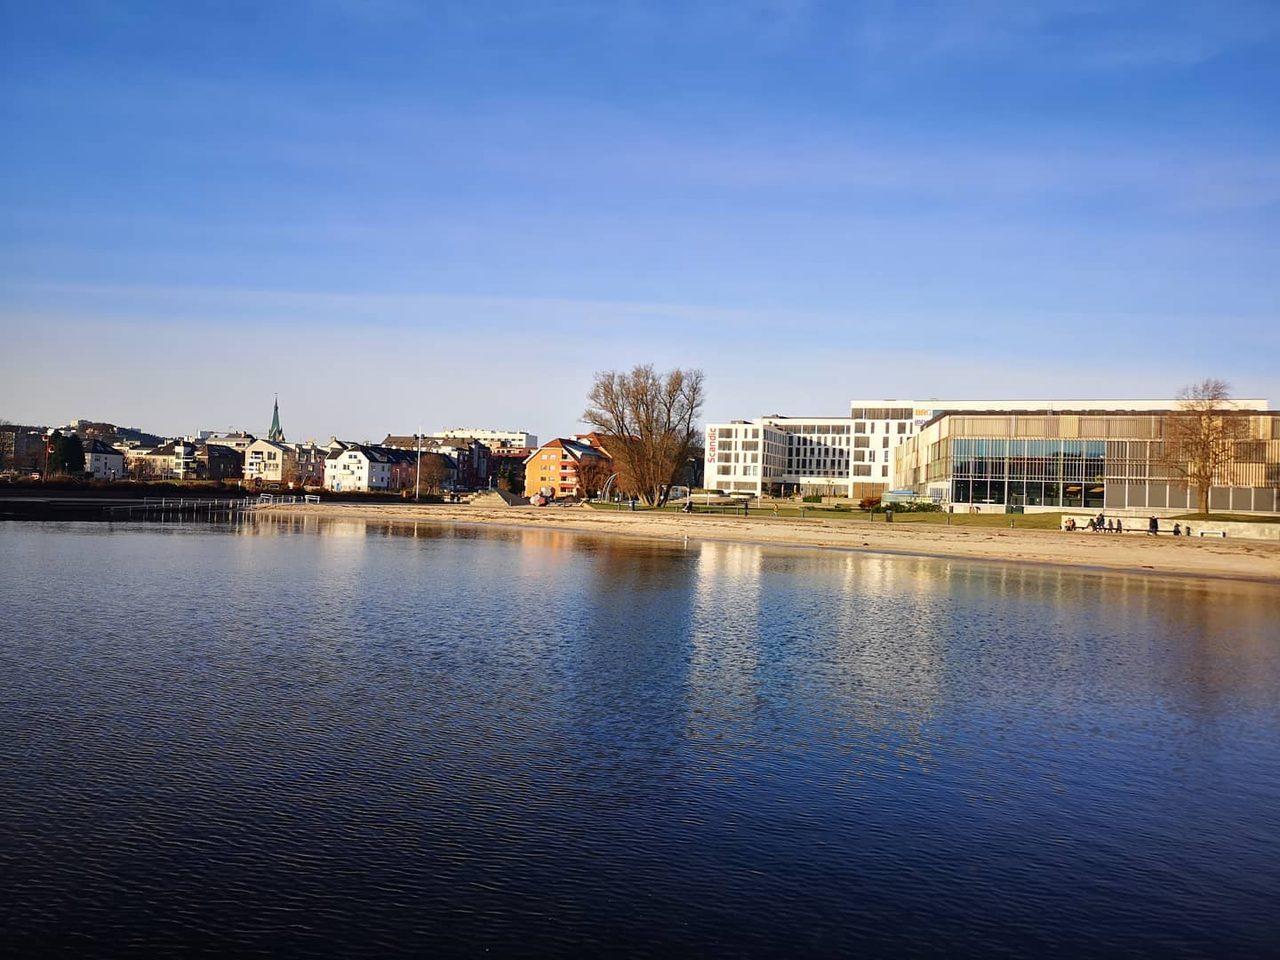 Water, Sky, Building, Cloud, Lake, Bank